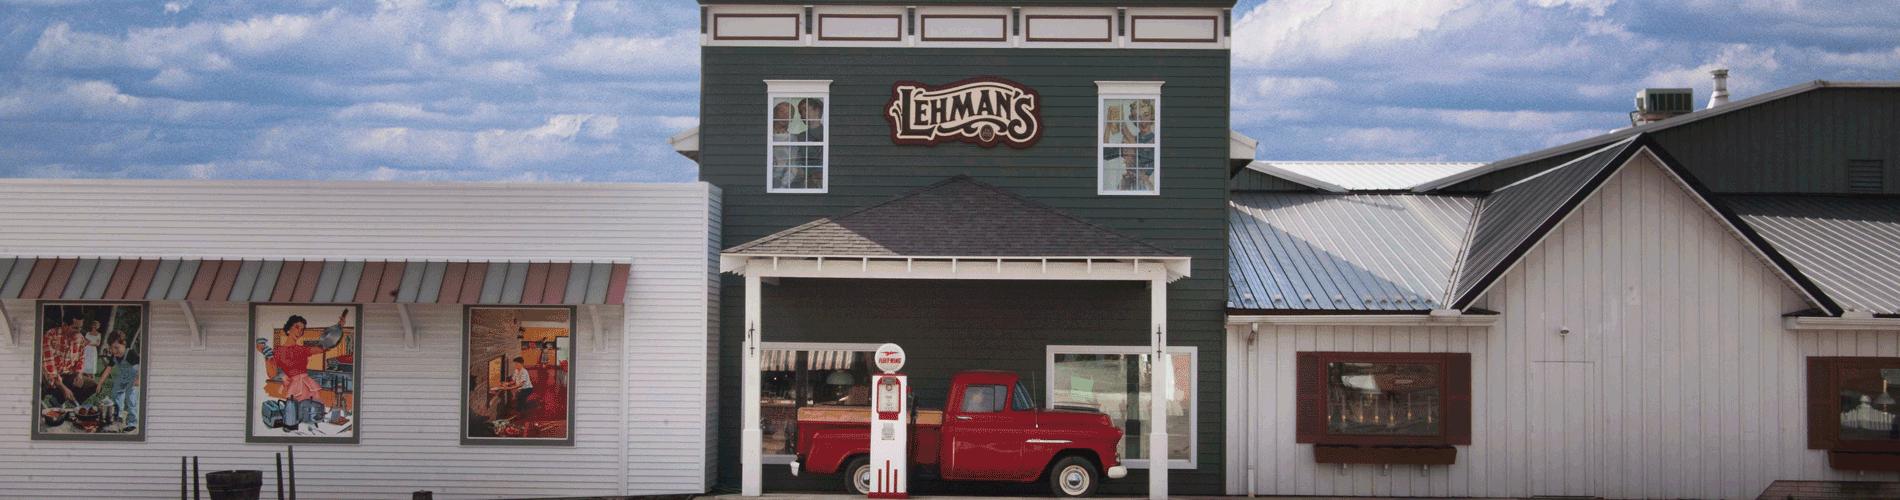 lehmans-storefront